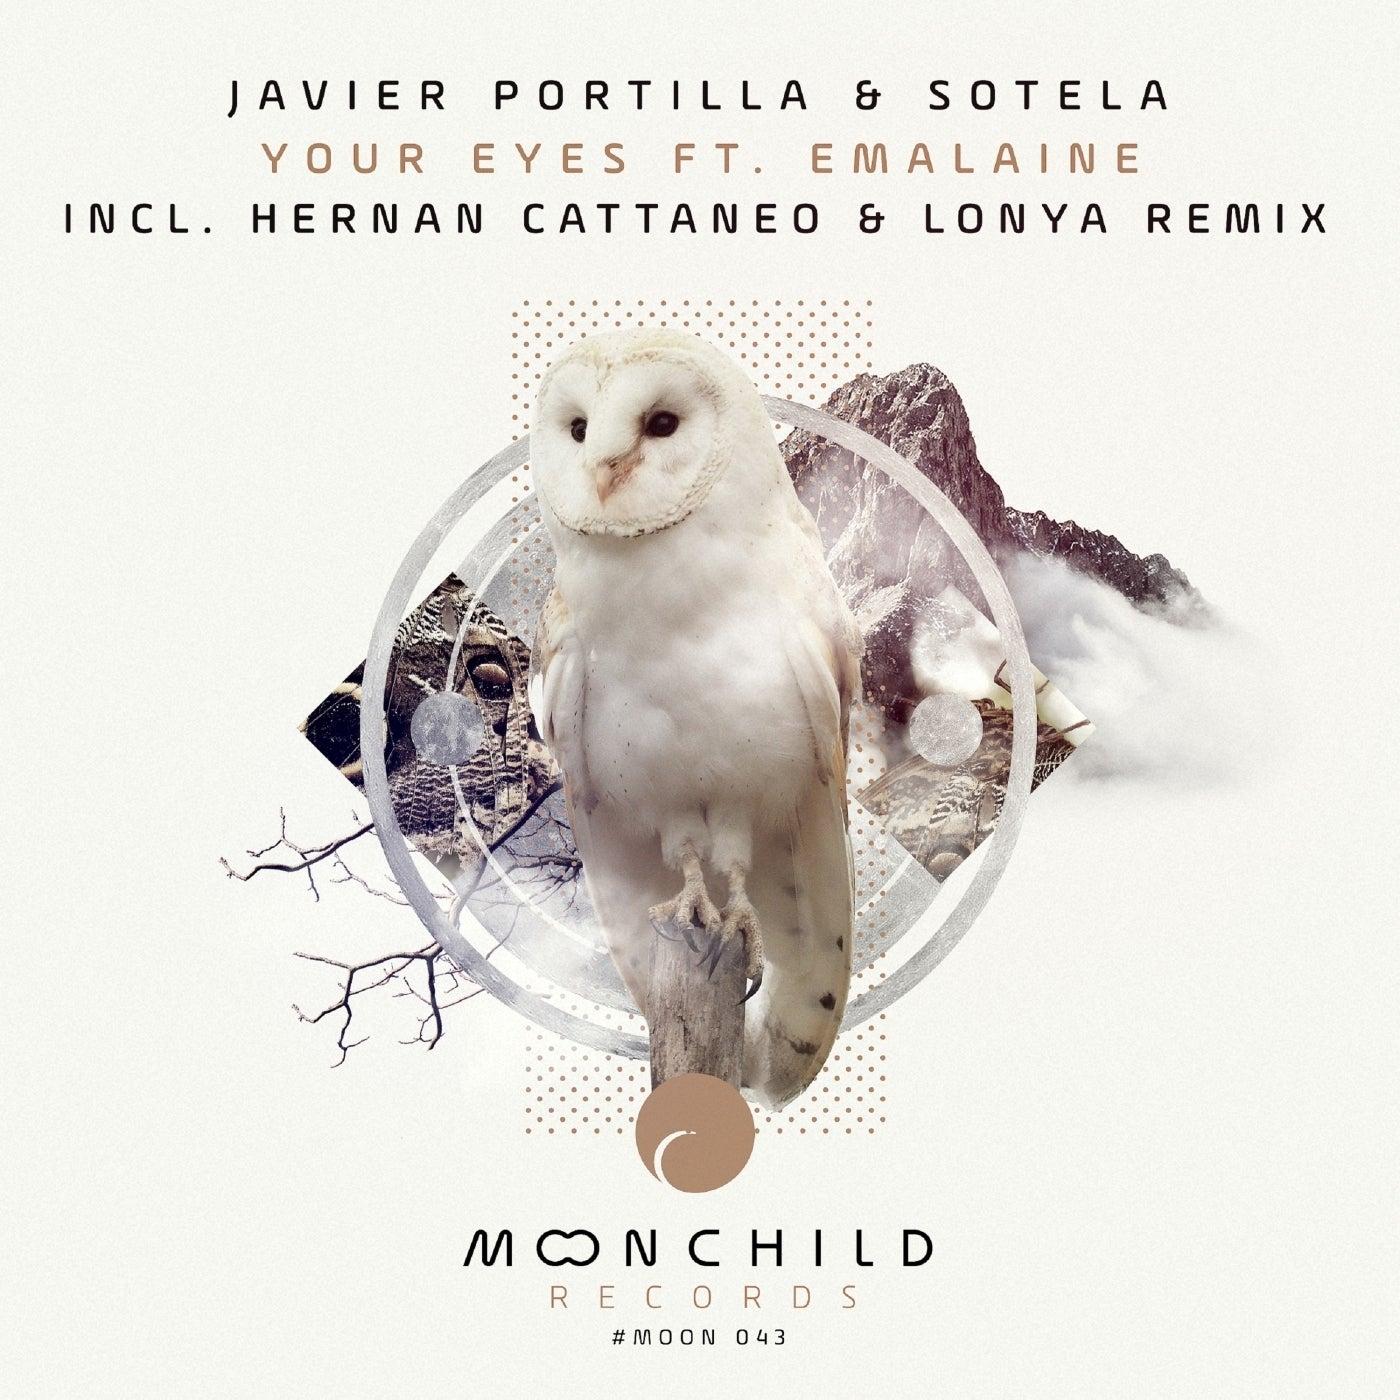 Your Eyes (Hernan Cattaneo & Lonya Remix)